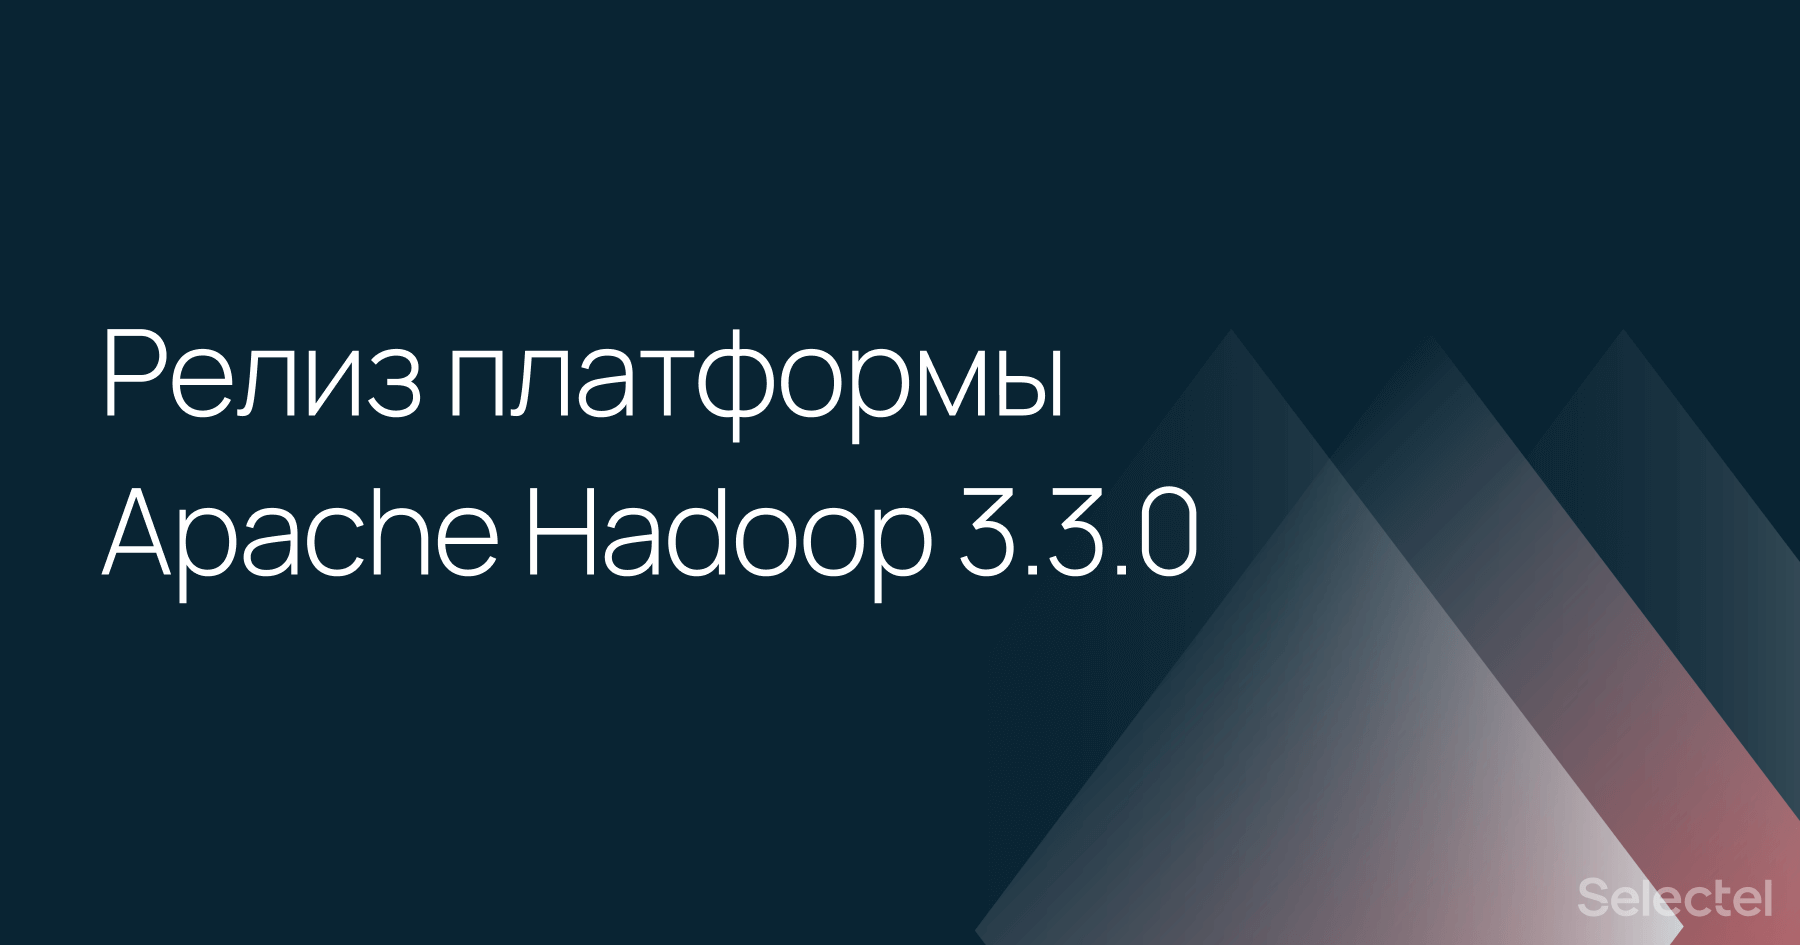 Apache Software Foundation опубликовала релиз платформы Apache Hadoop 3.3.0 - 1